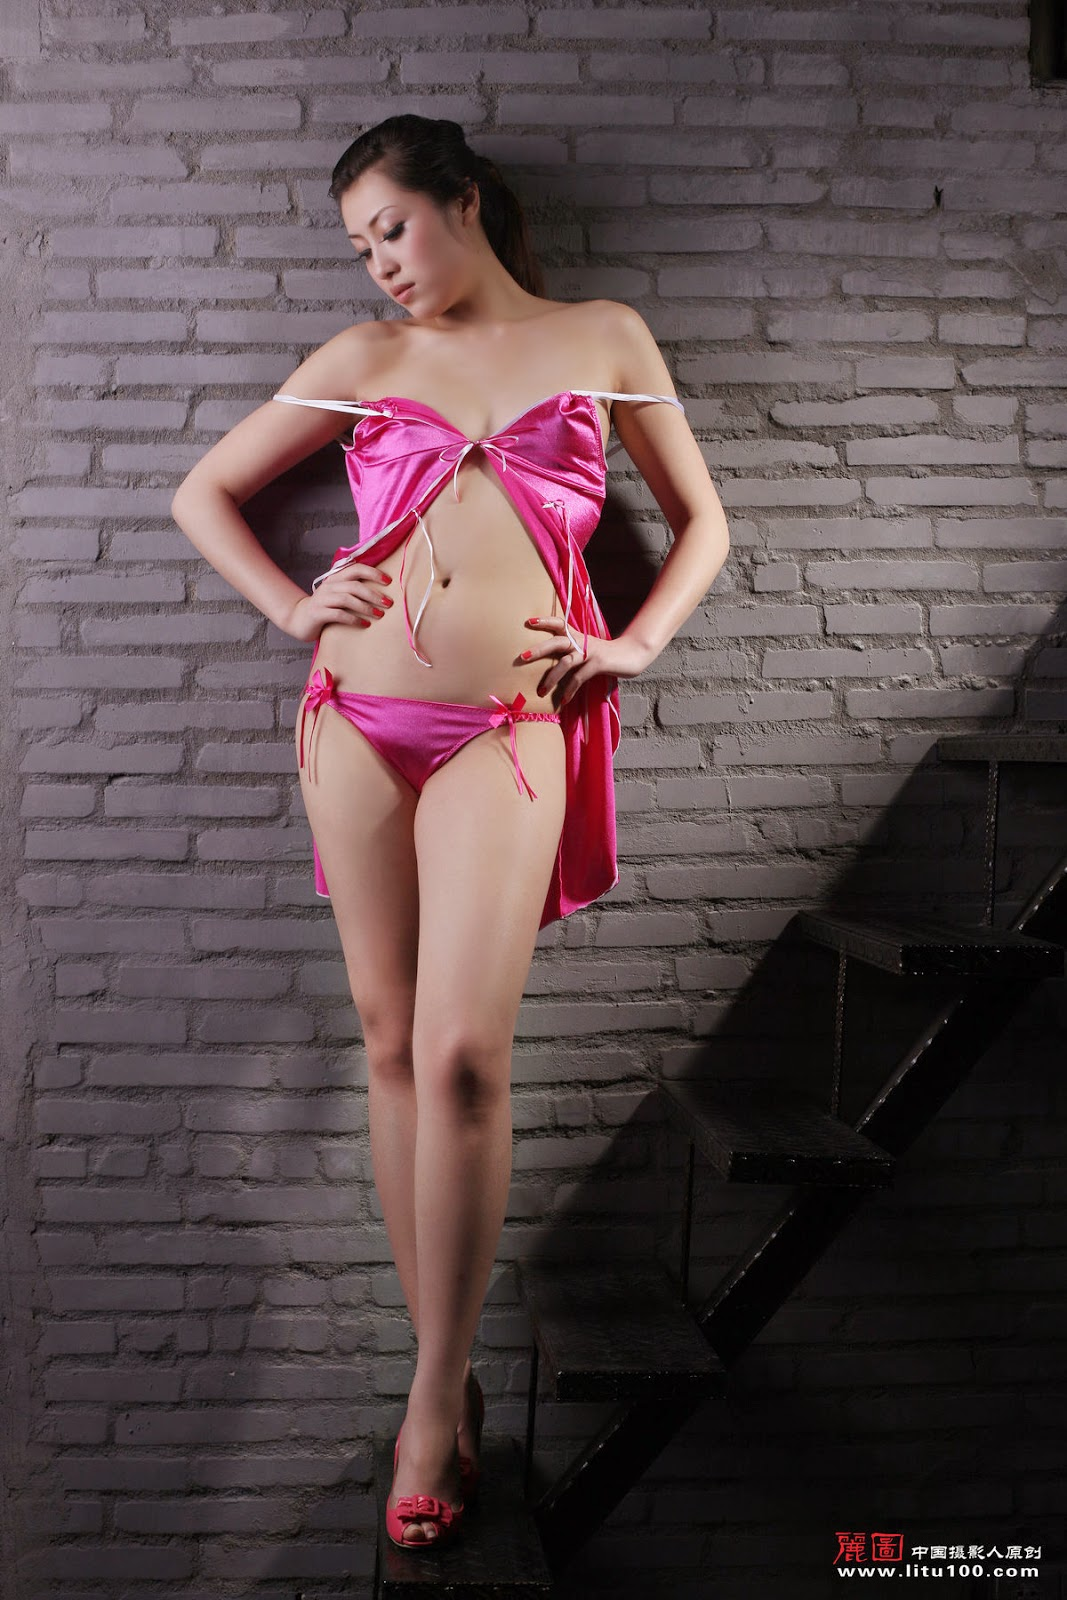 Nude Model Photos